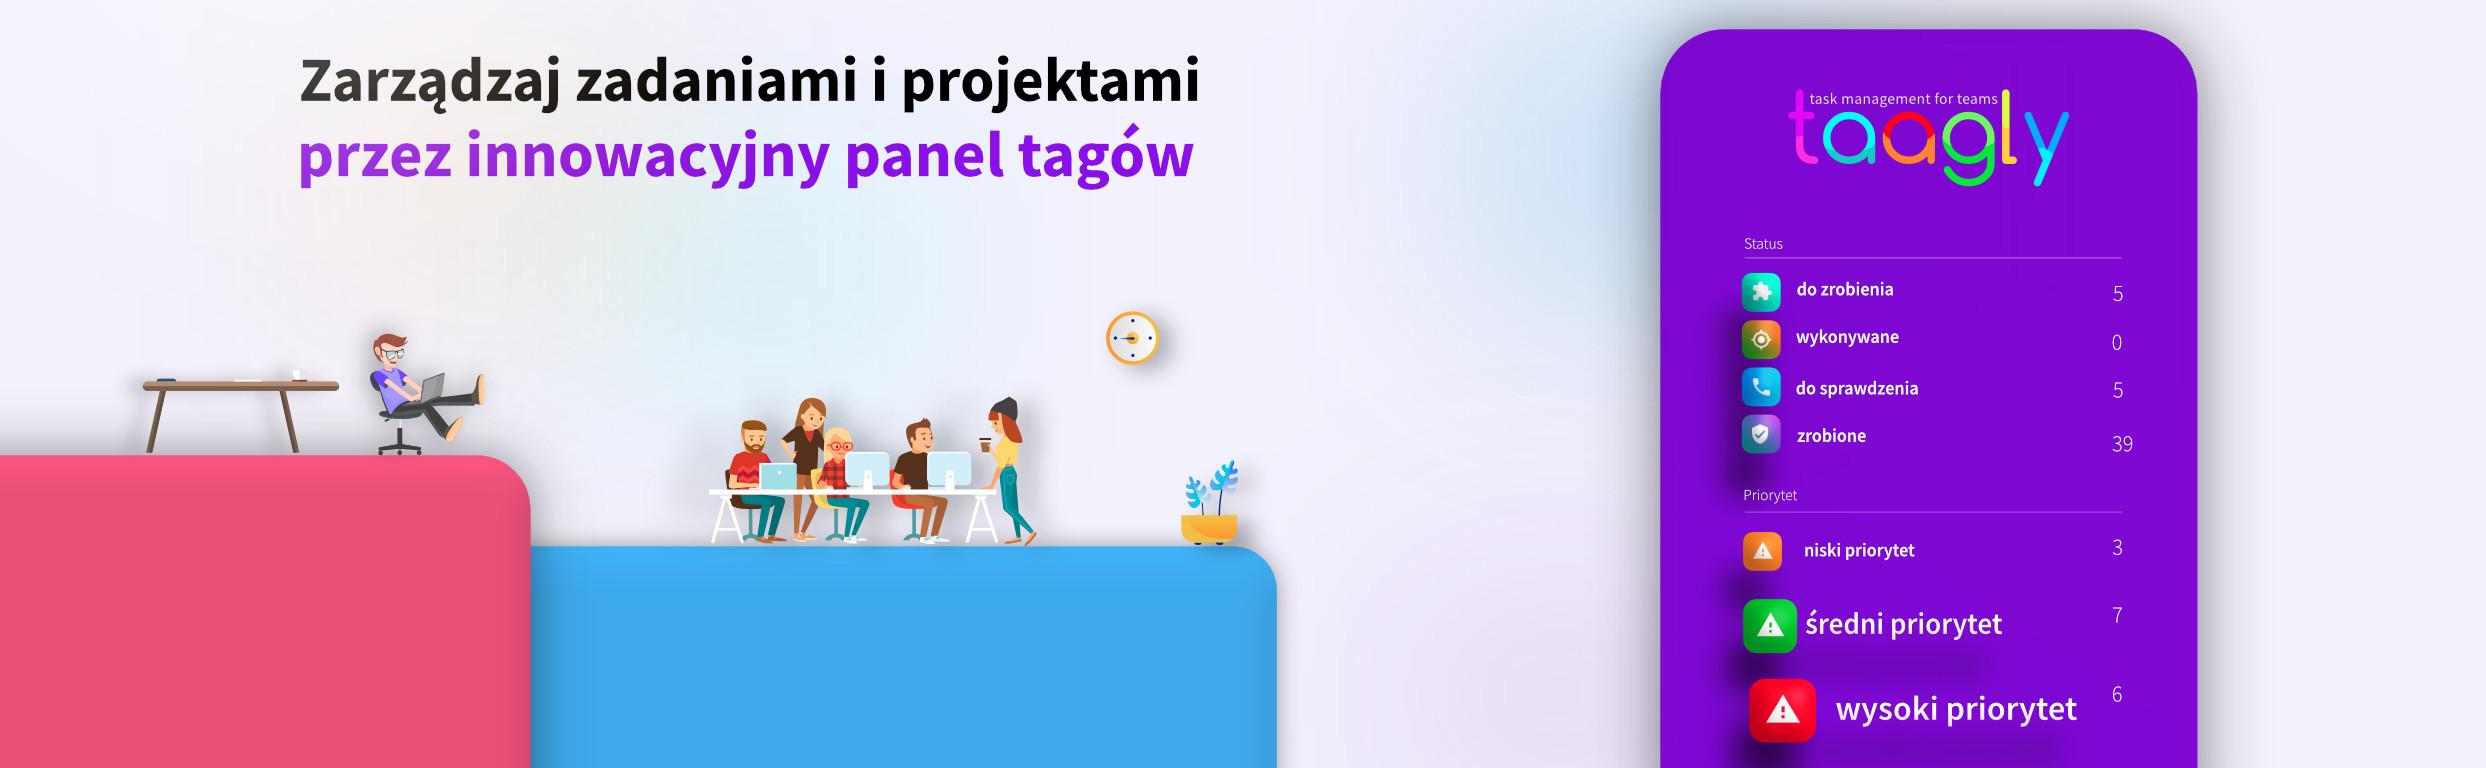 Zrzut ekranu 2019 11 17 o 16.53.07